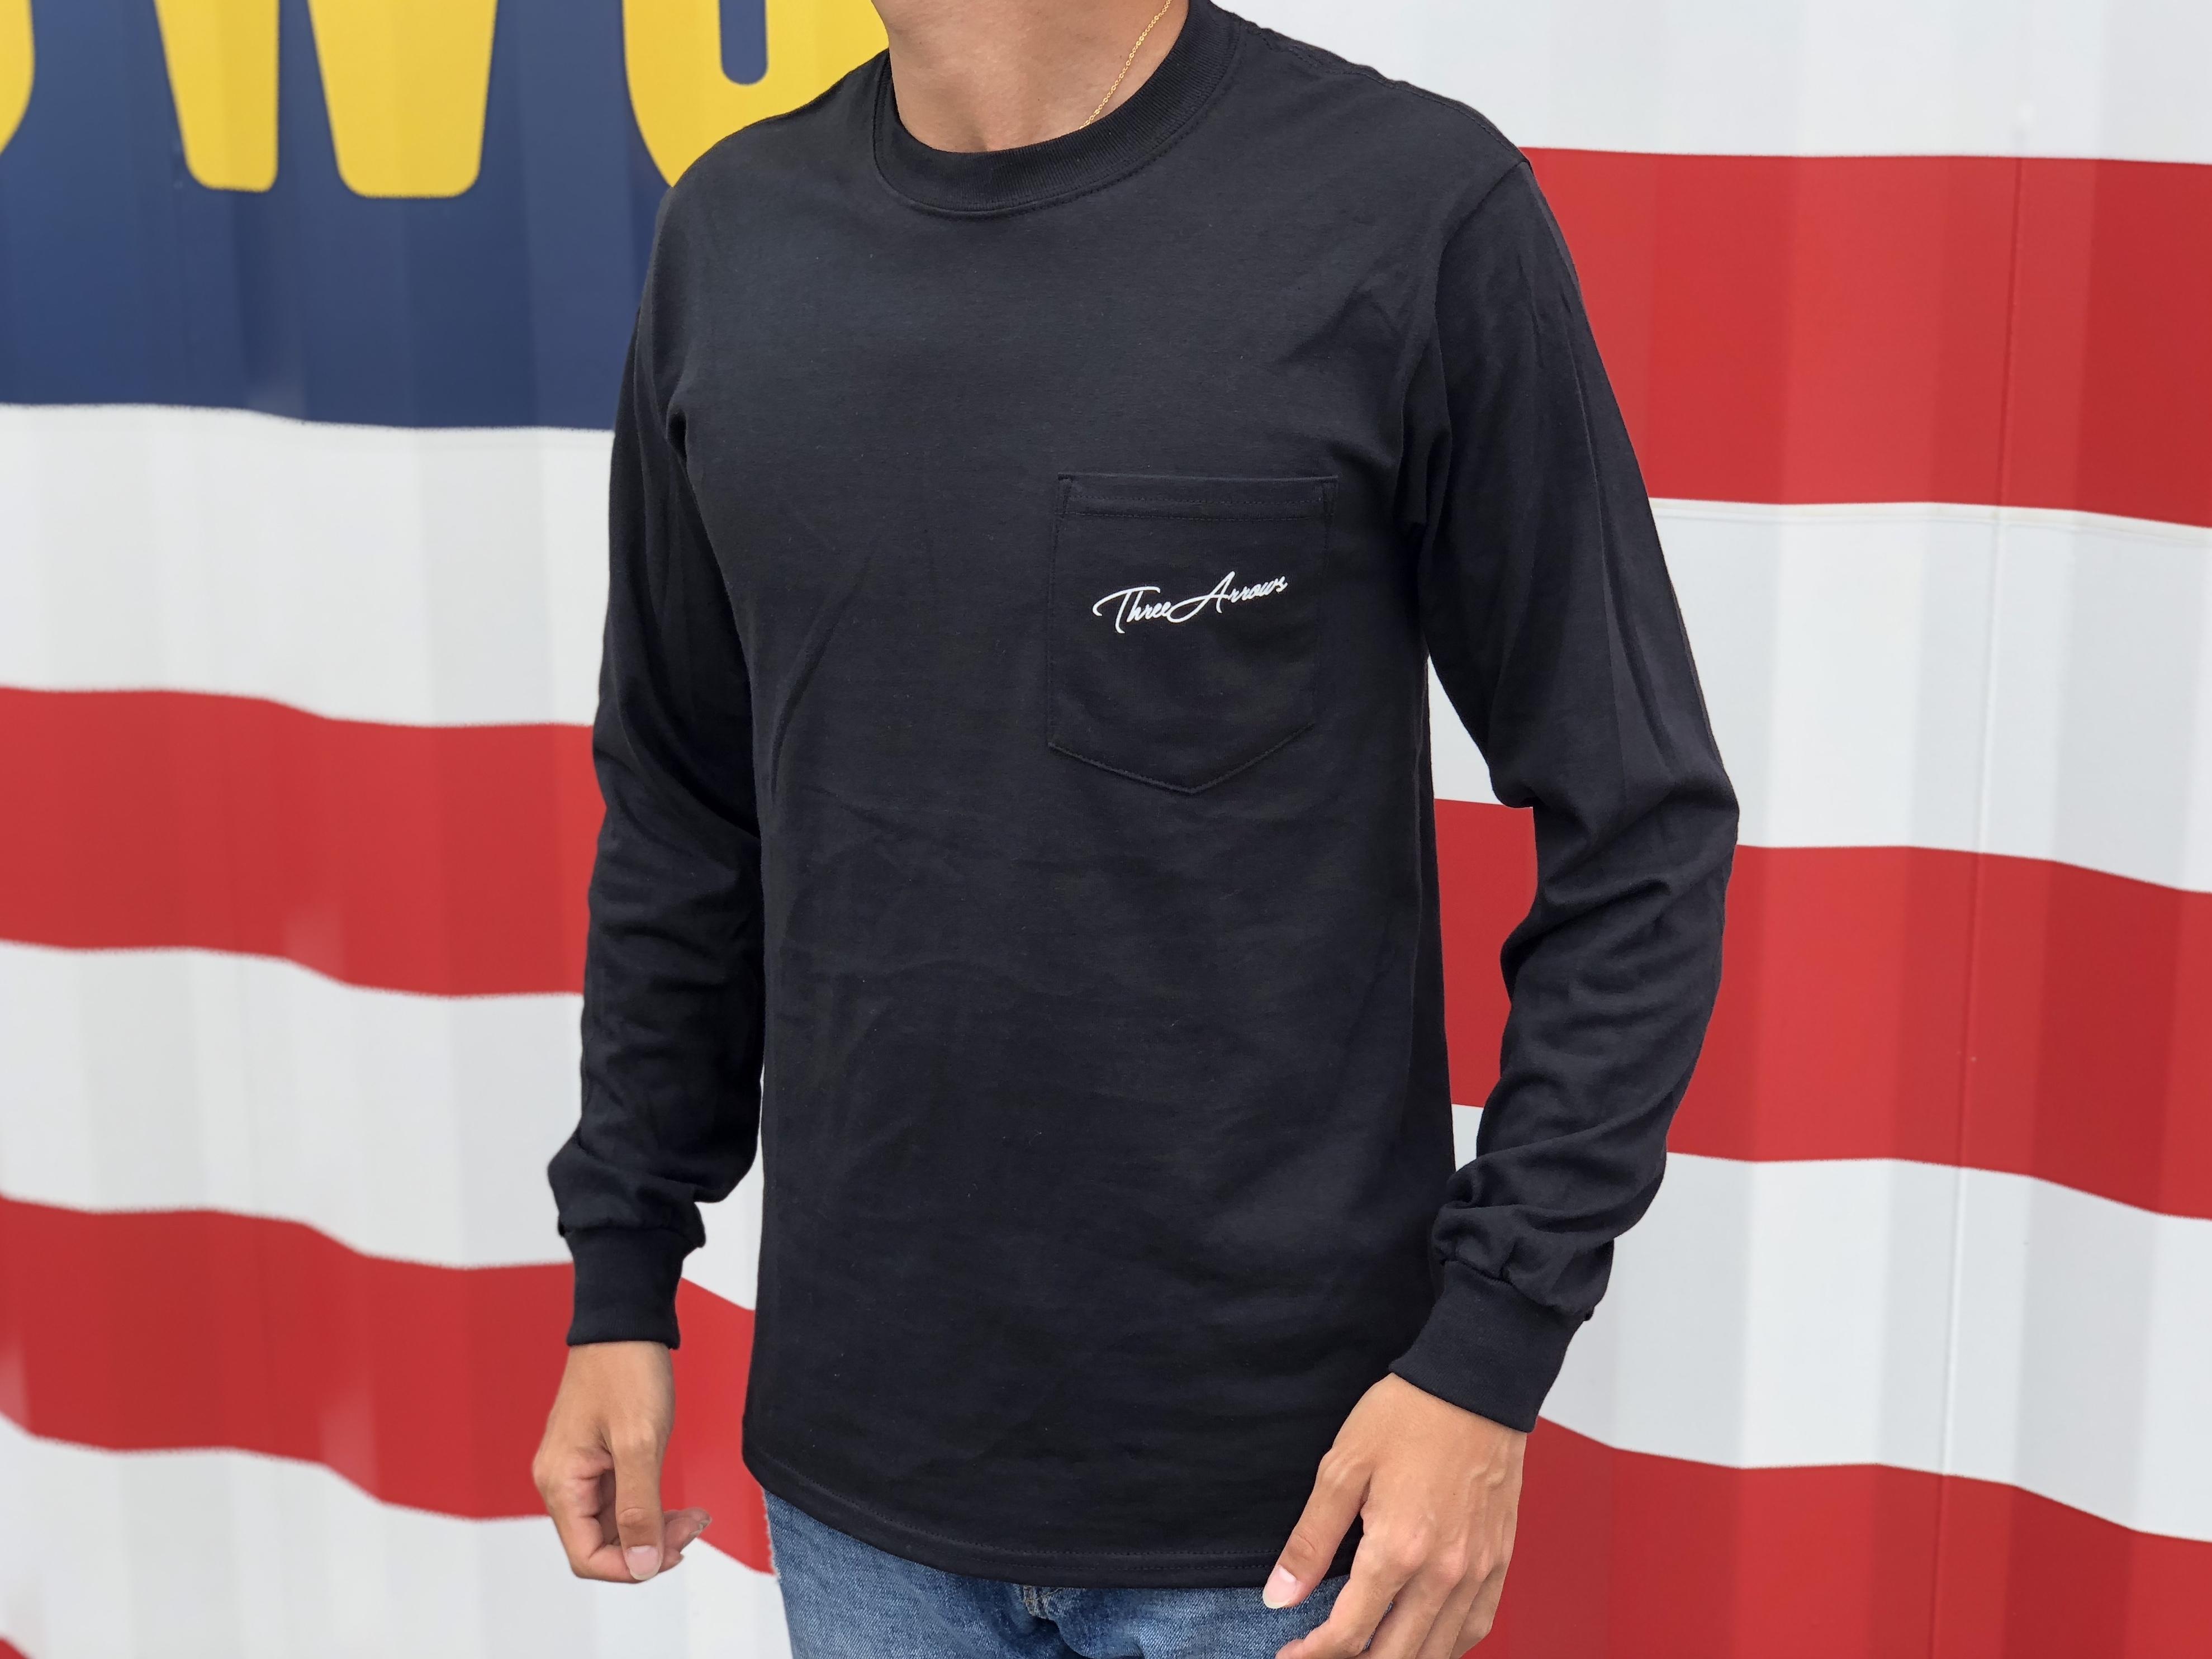 ThreeArrows ポケット付きロングTシャツ(black)